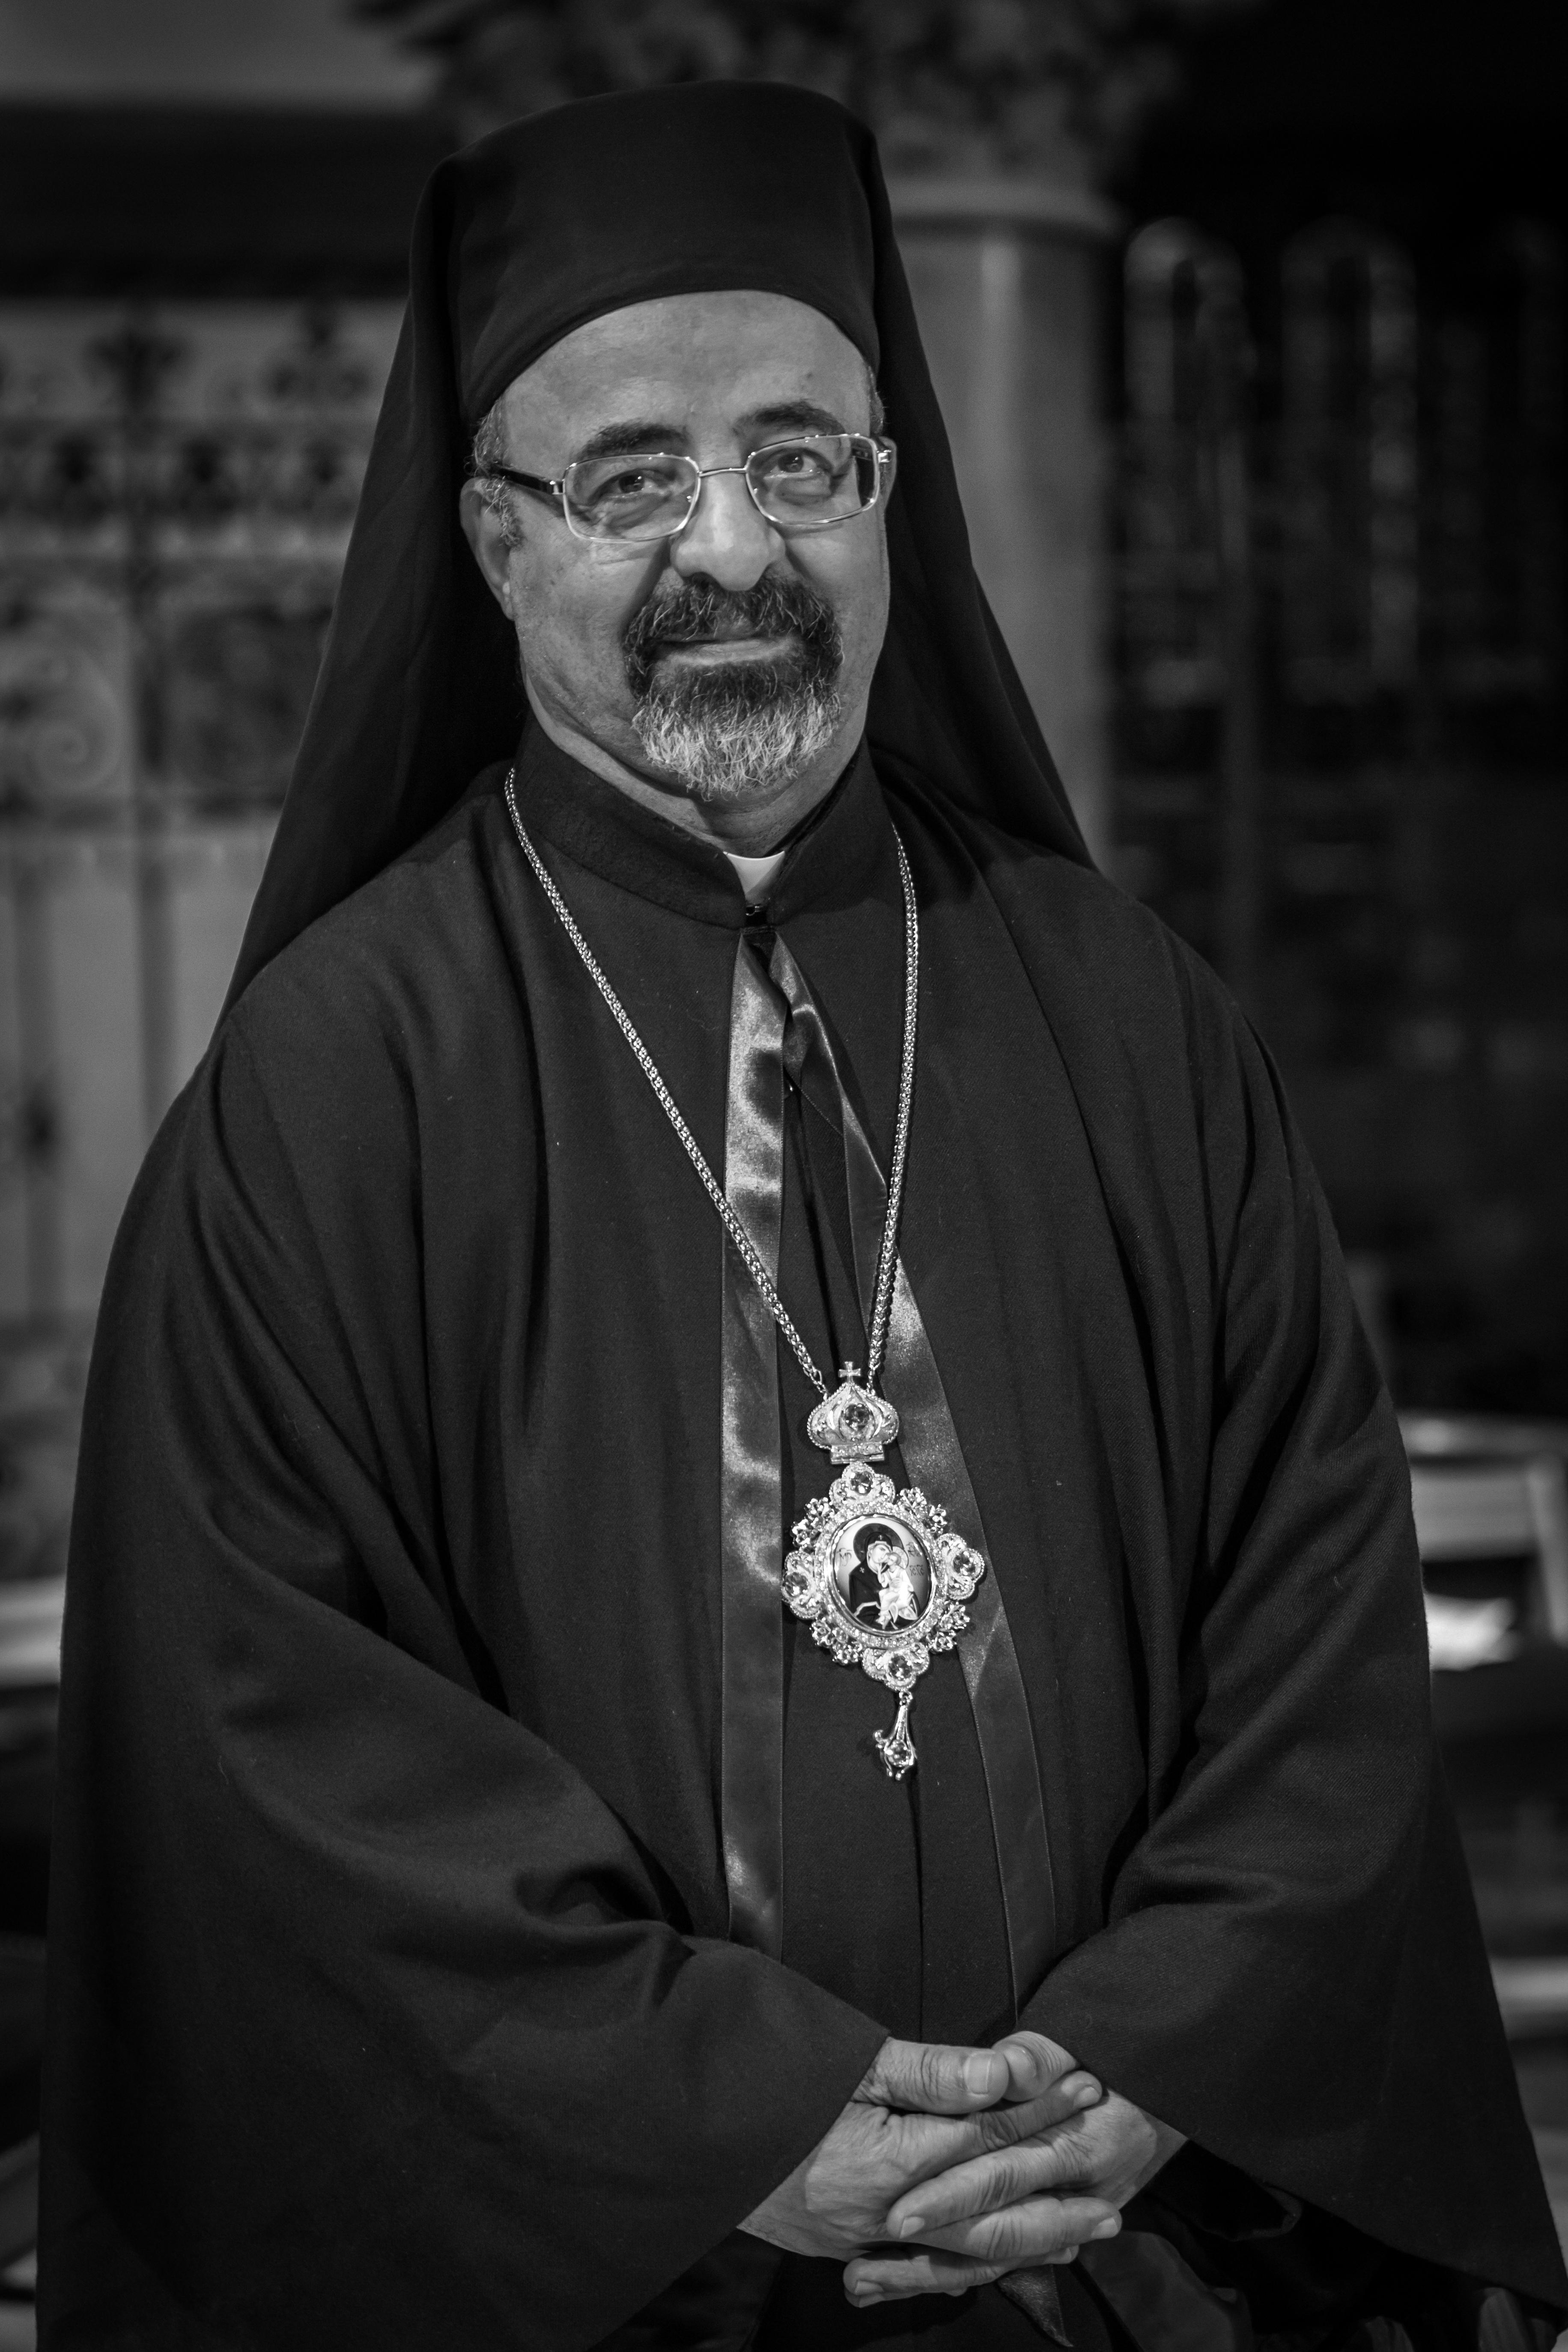 Arcebispo Ibrahim Isaac Sidrak em Estrasburgo, março de 2014.